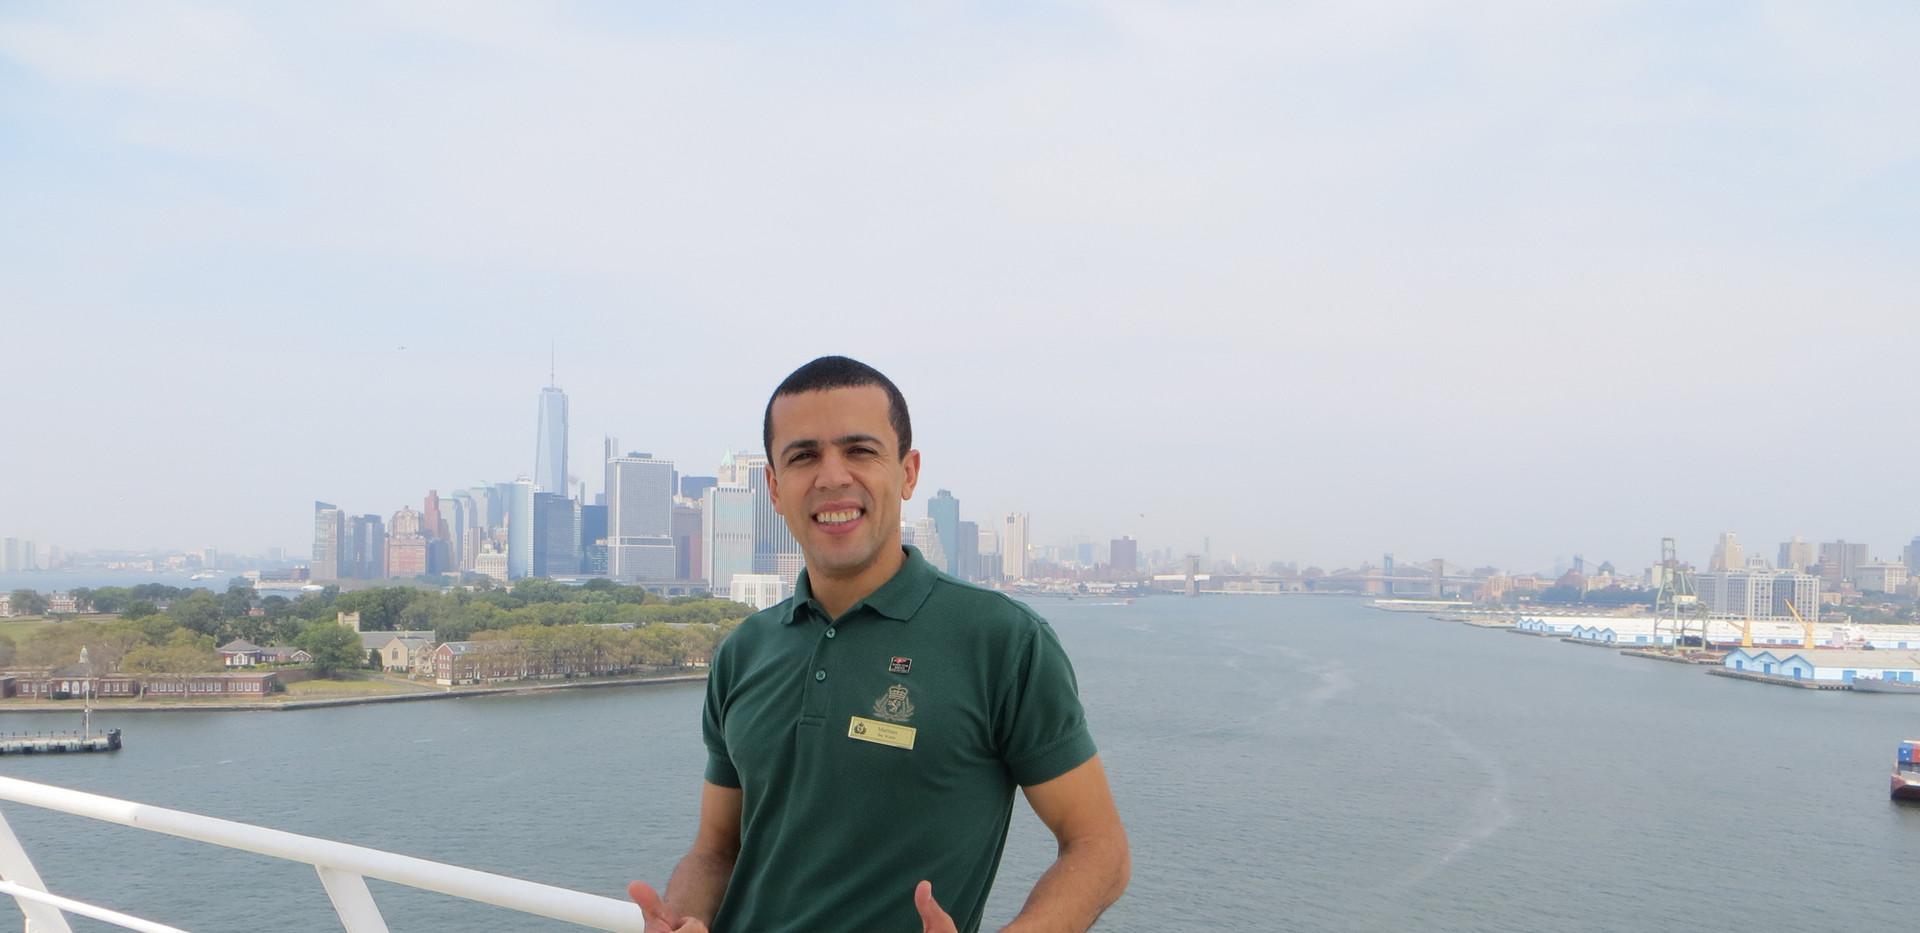 New York on baord Queen Mary 2 2013 .JPG